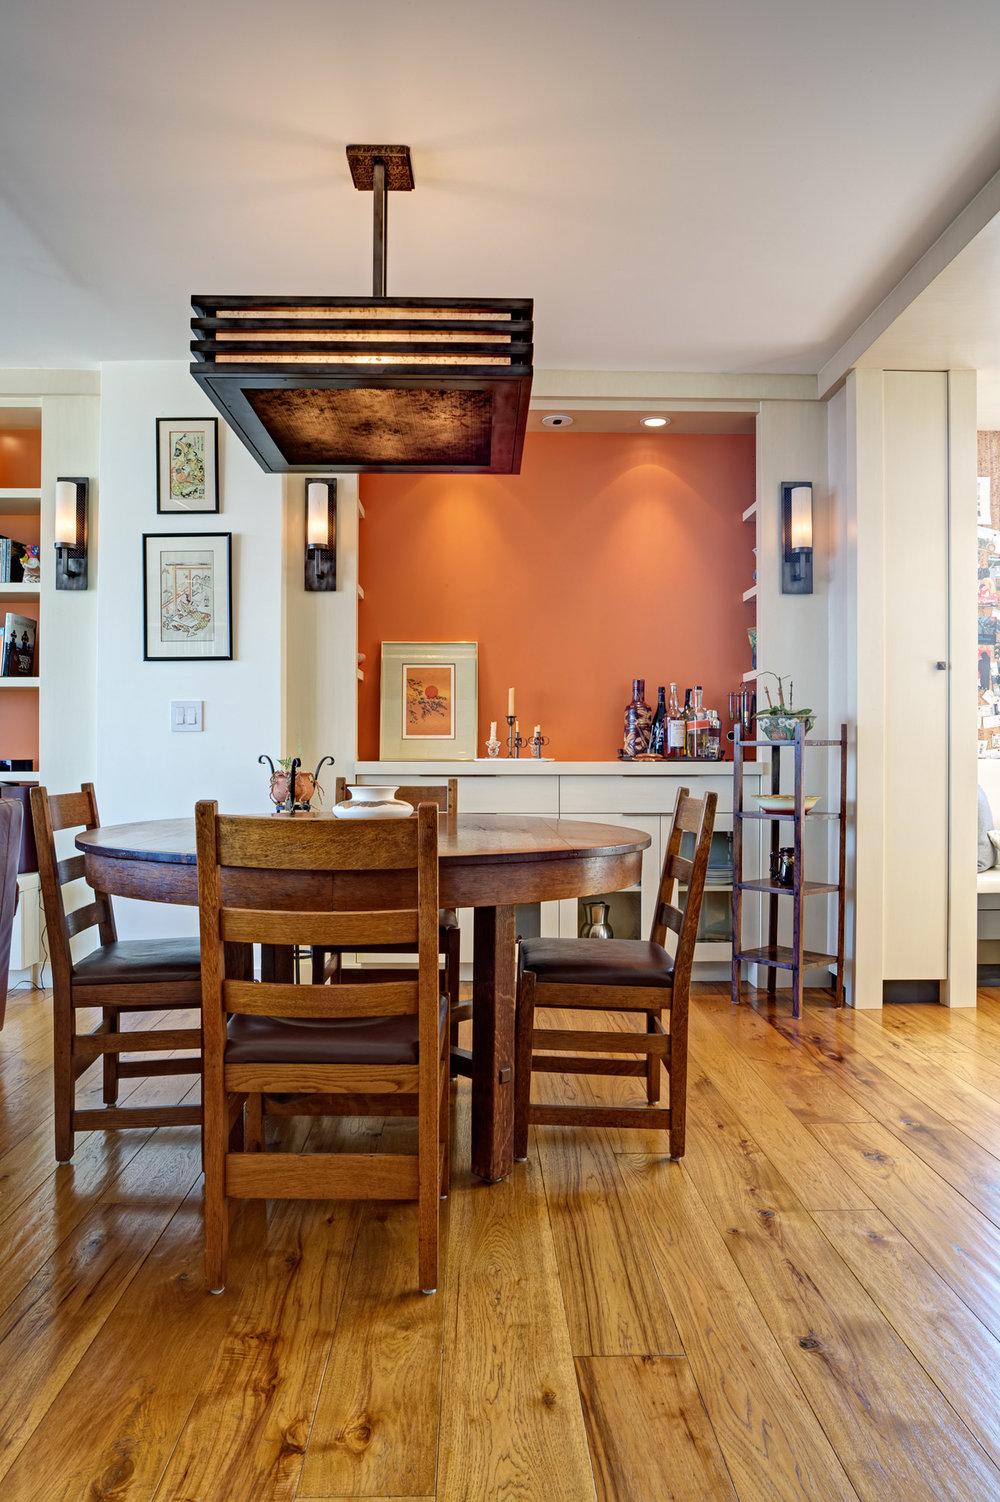 Kaplan-Architects-high-rise-interior-dining-area.jpg